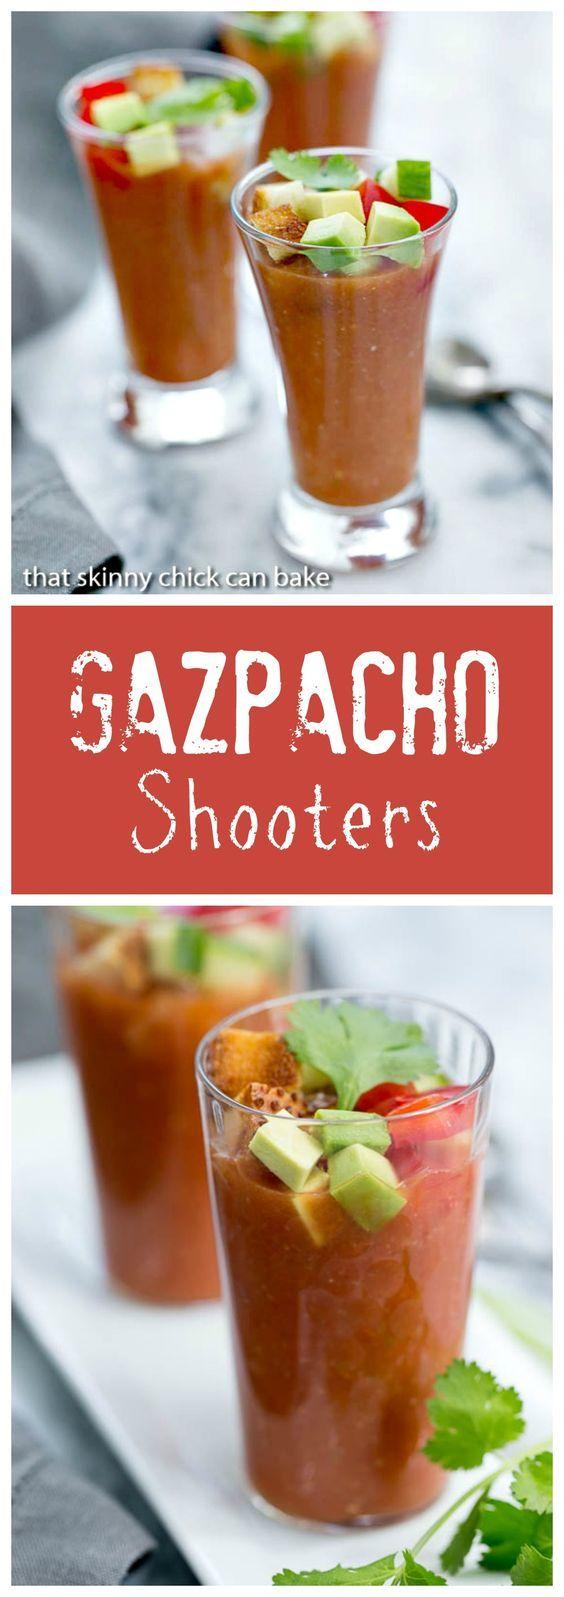 Gazpacho Shooters | Appetizer size portions of the classic Spanish gazpacho @lizzydo